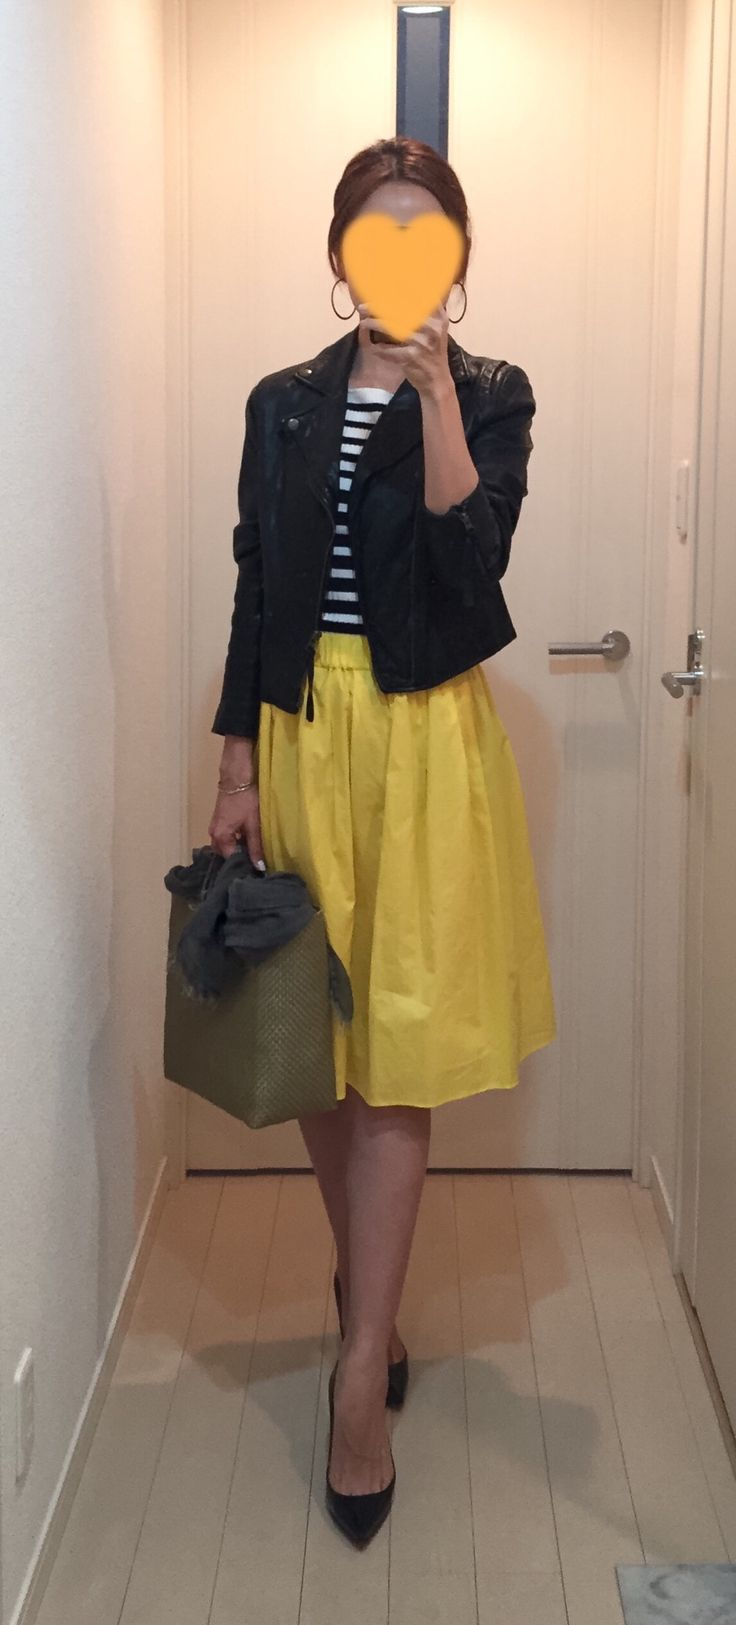 Leather jacket: IENA, Striped top: H&M, Yellow skirt: Nolley's, Bag: la kagu, Pumps: Christian louboutin